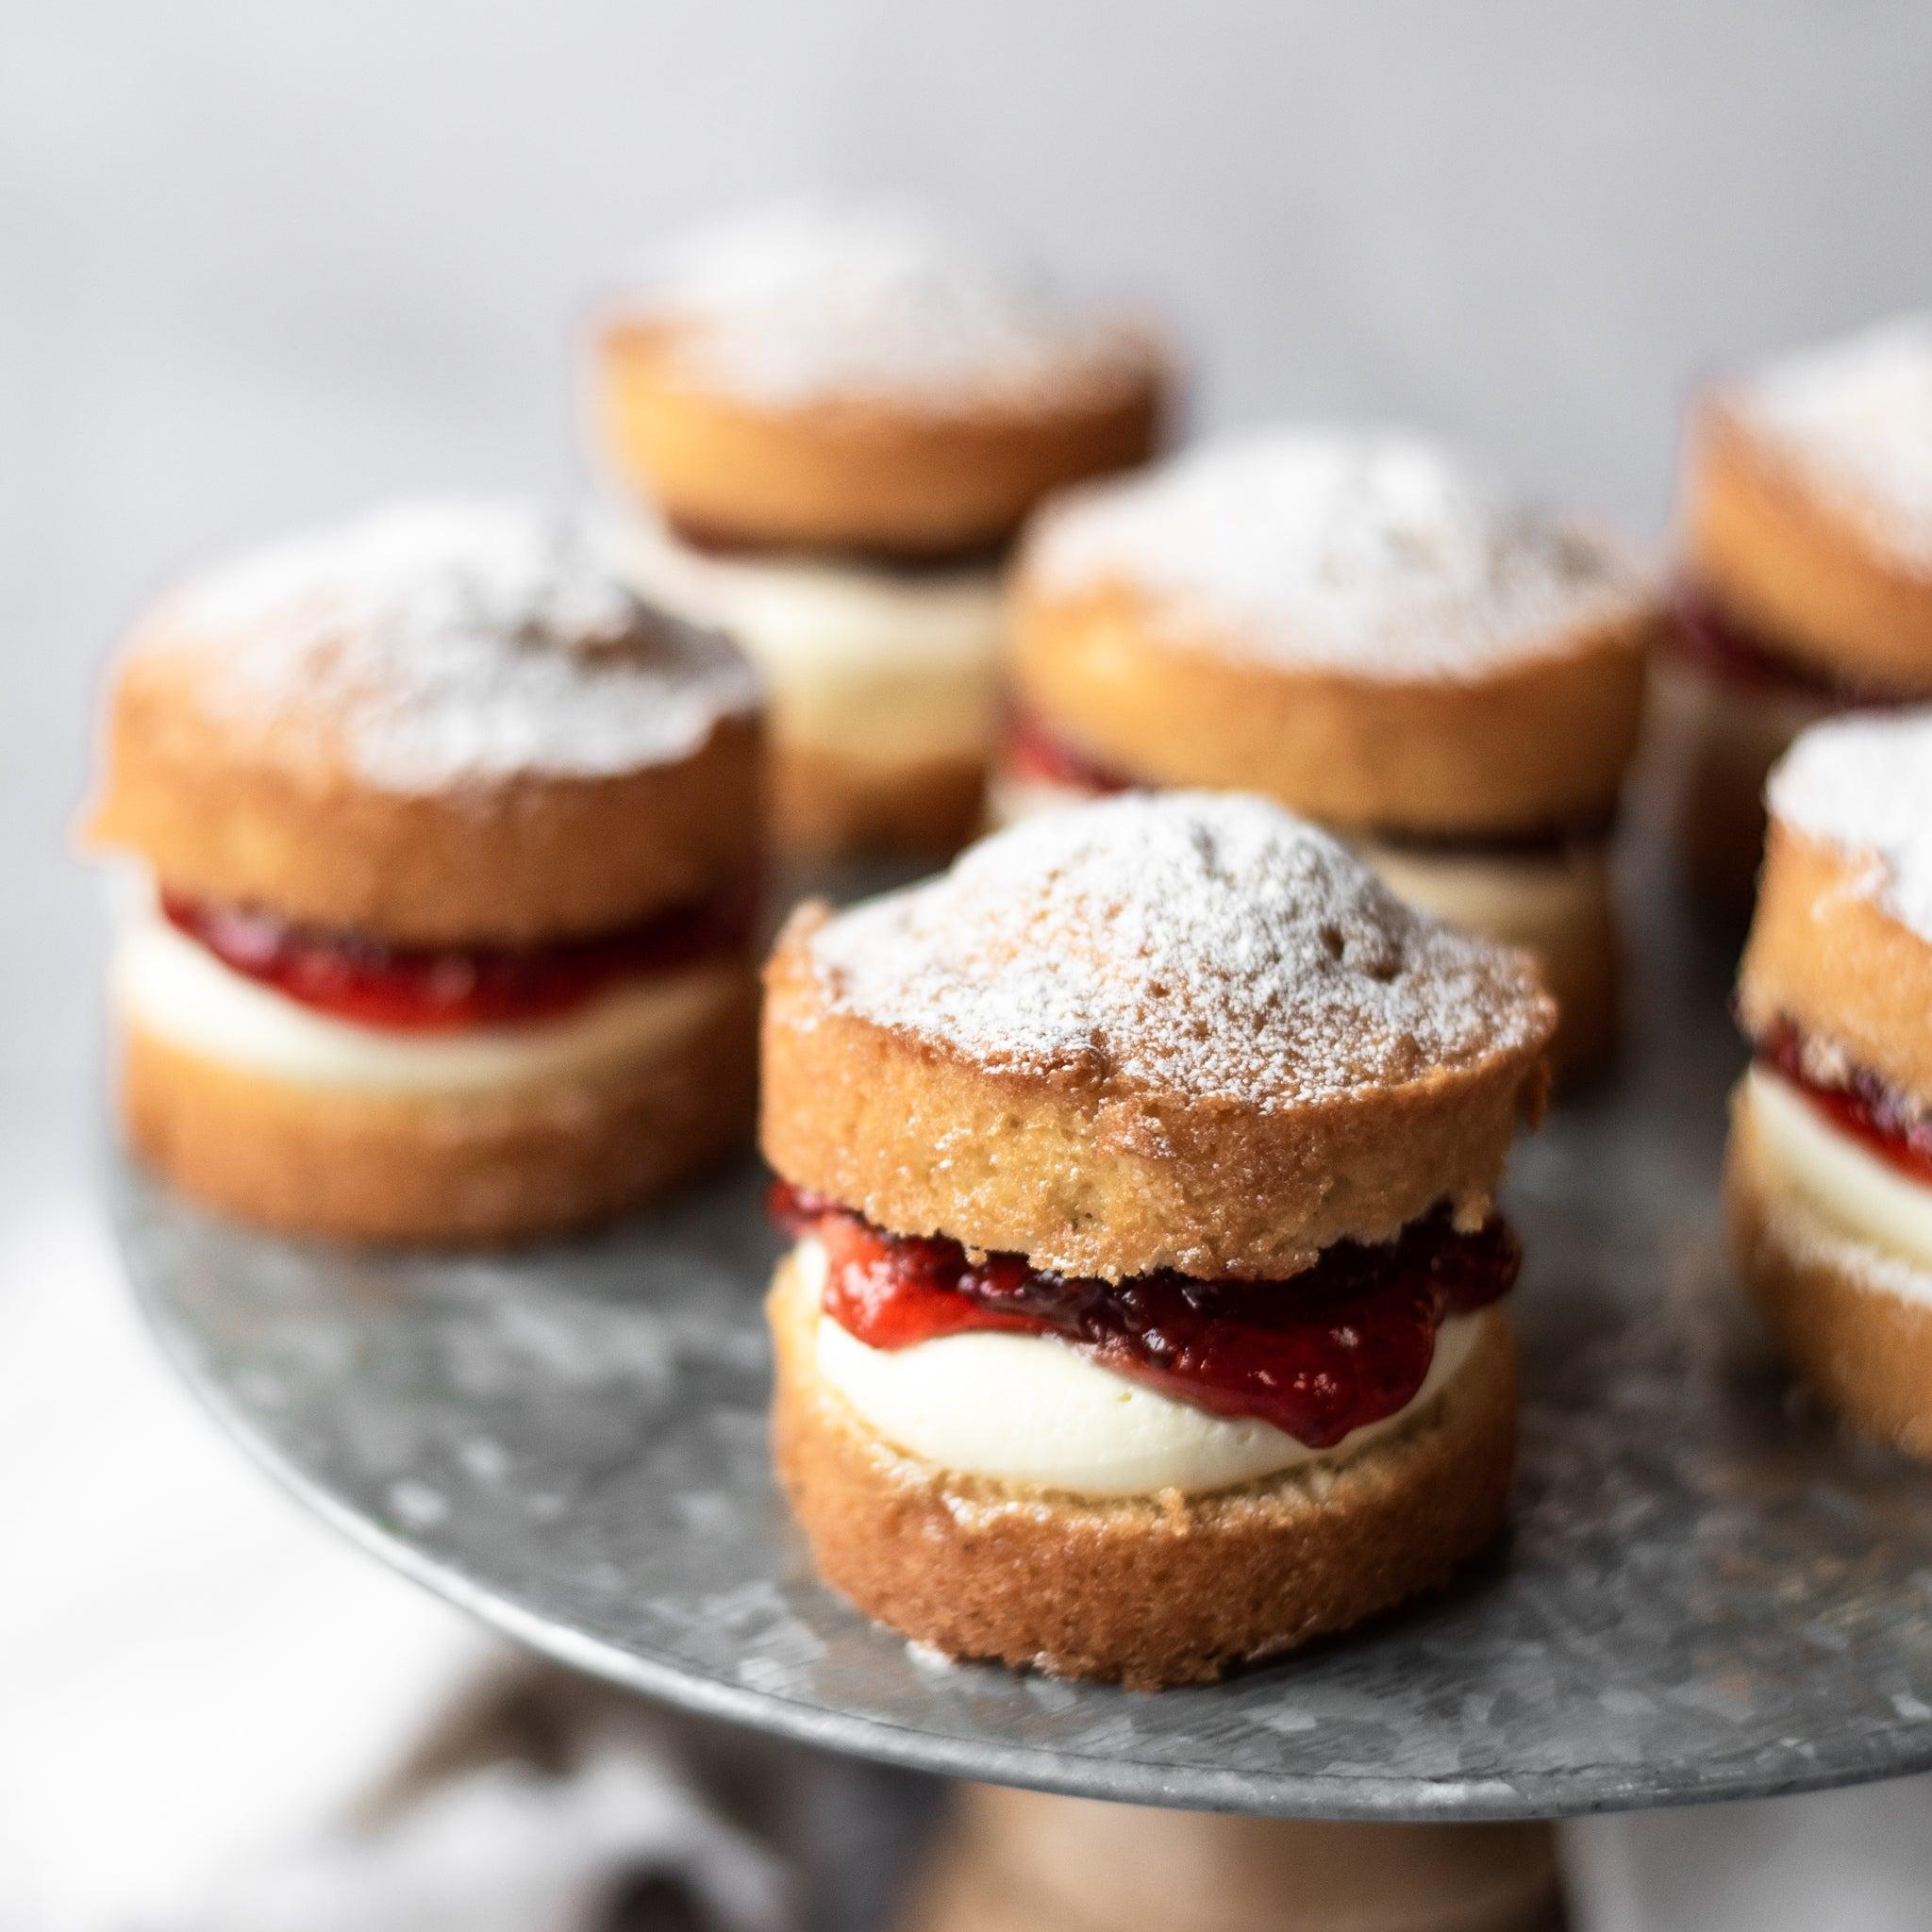 Strawberry-and-Rosewater-Mini-Sponge-Cakes-SQUARE-1.jpg